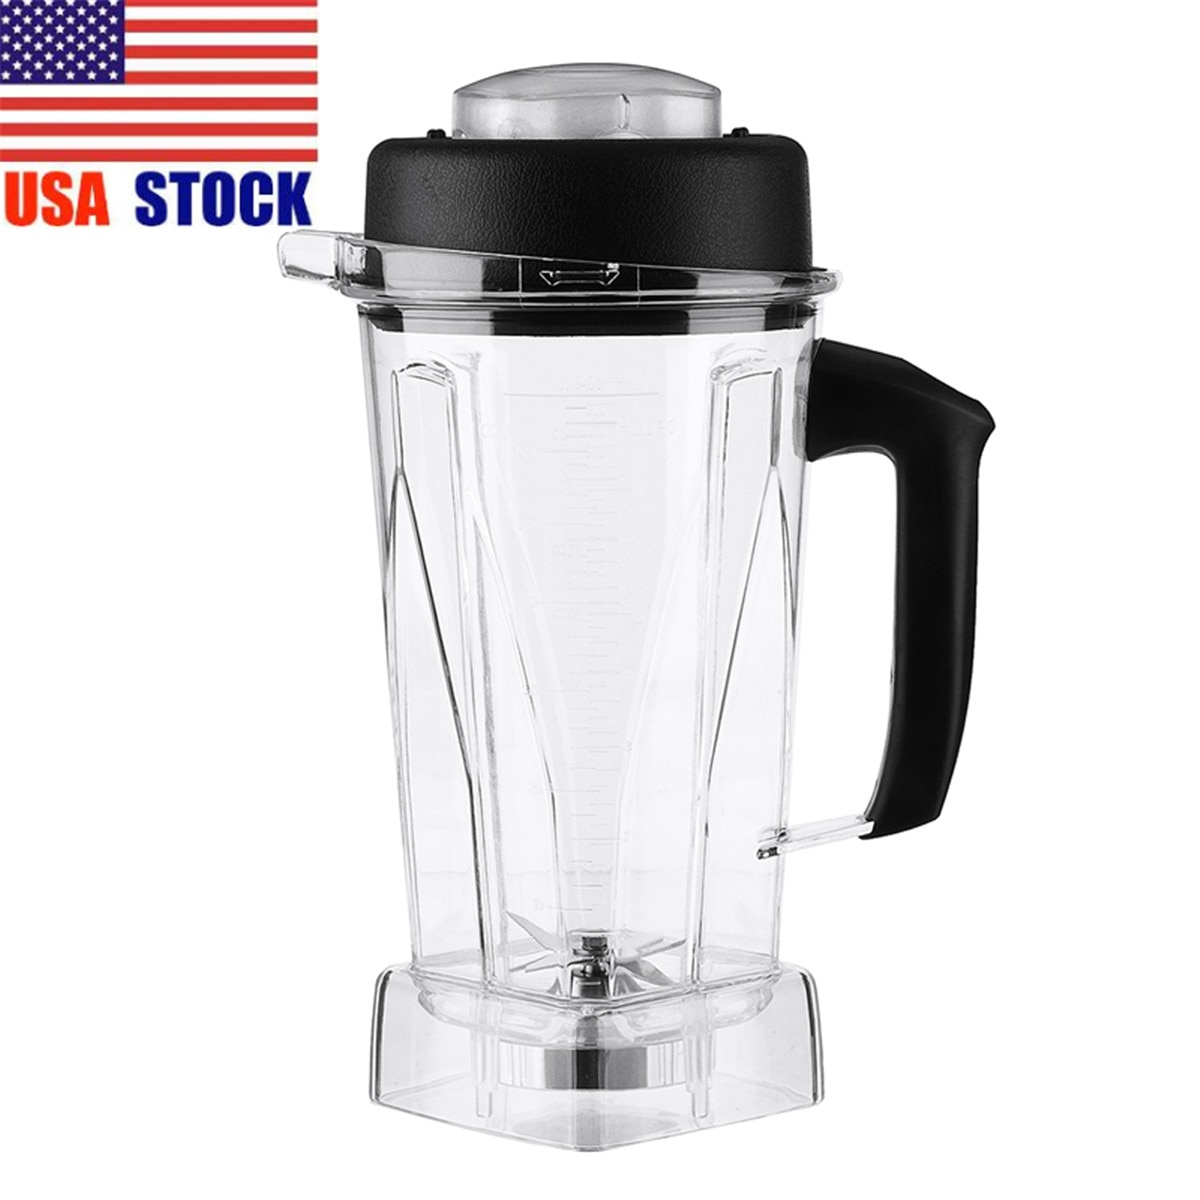 2L Container Jar Jug Pitcher Cup Commercial Blender/ Spare Parts for Vitamix 60oz Home Kitchen Appli